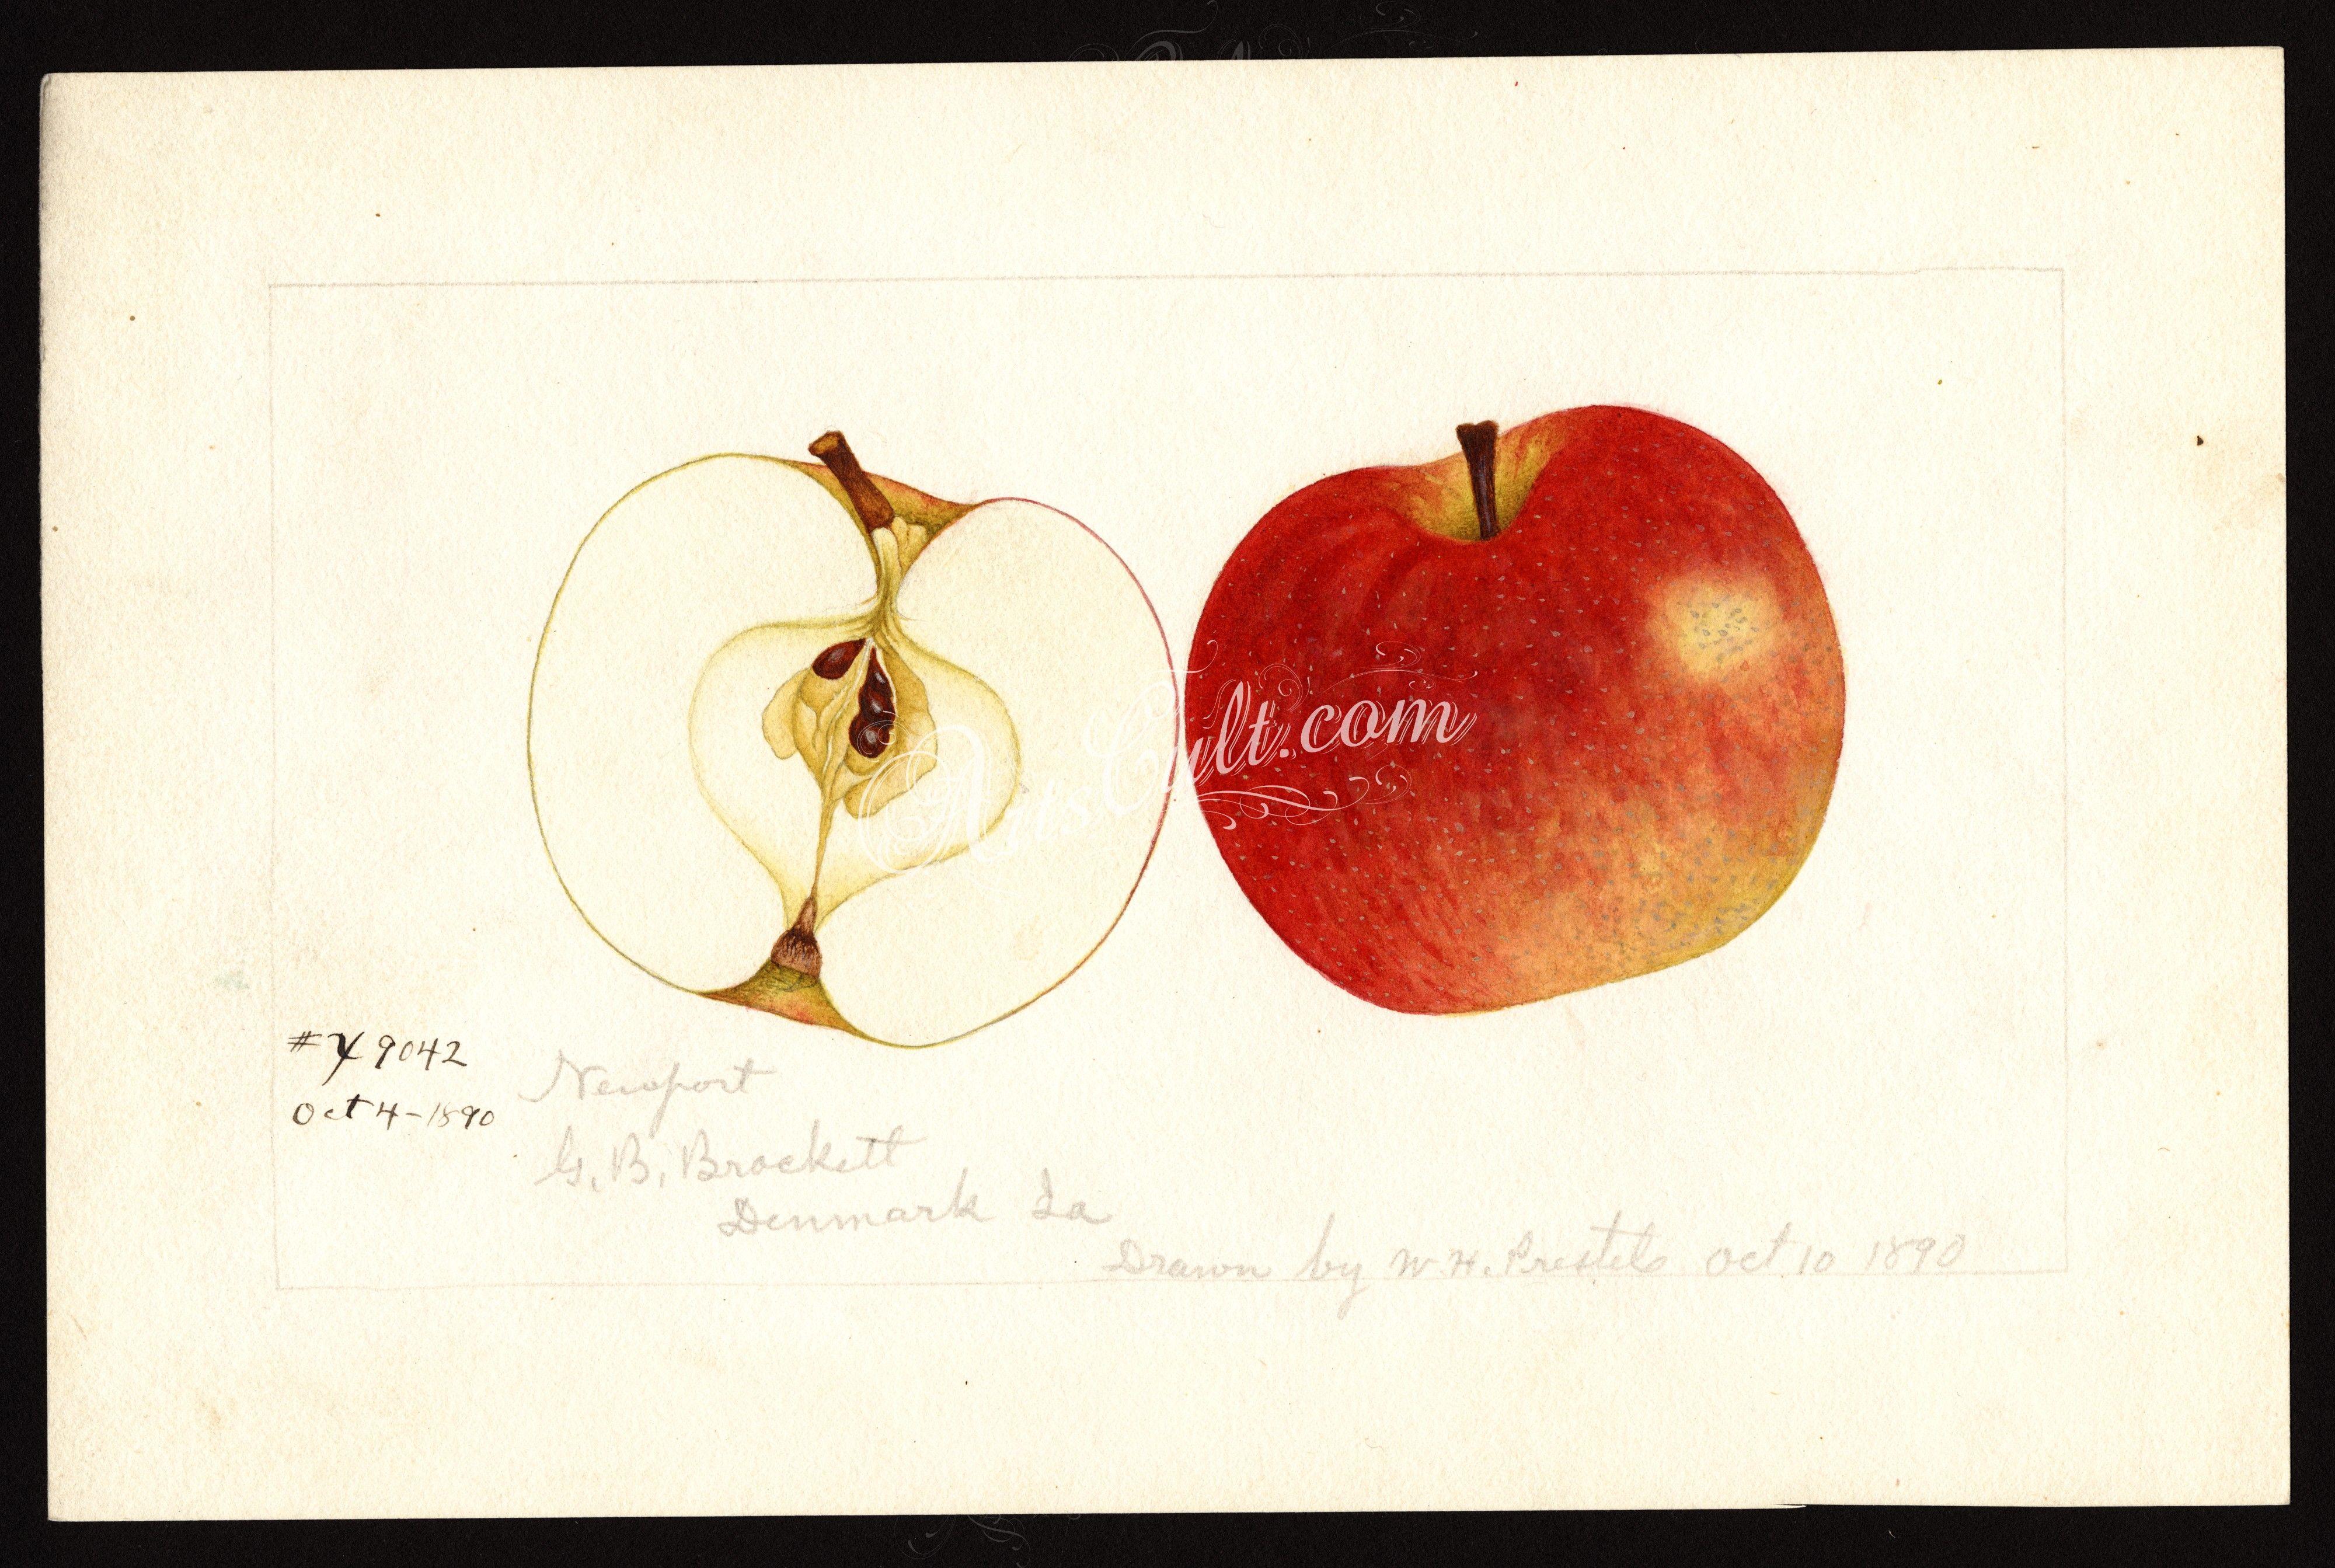 Apple malus domesticanewport botanical floral botany